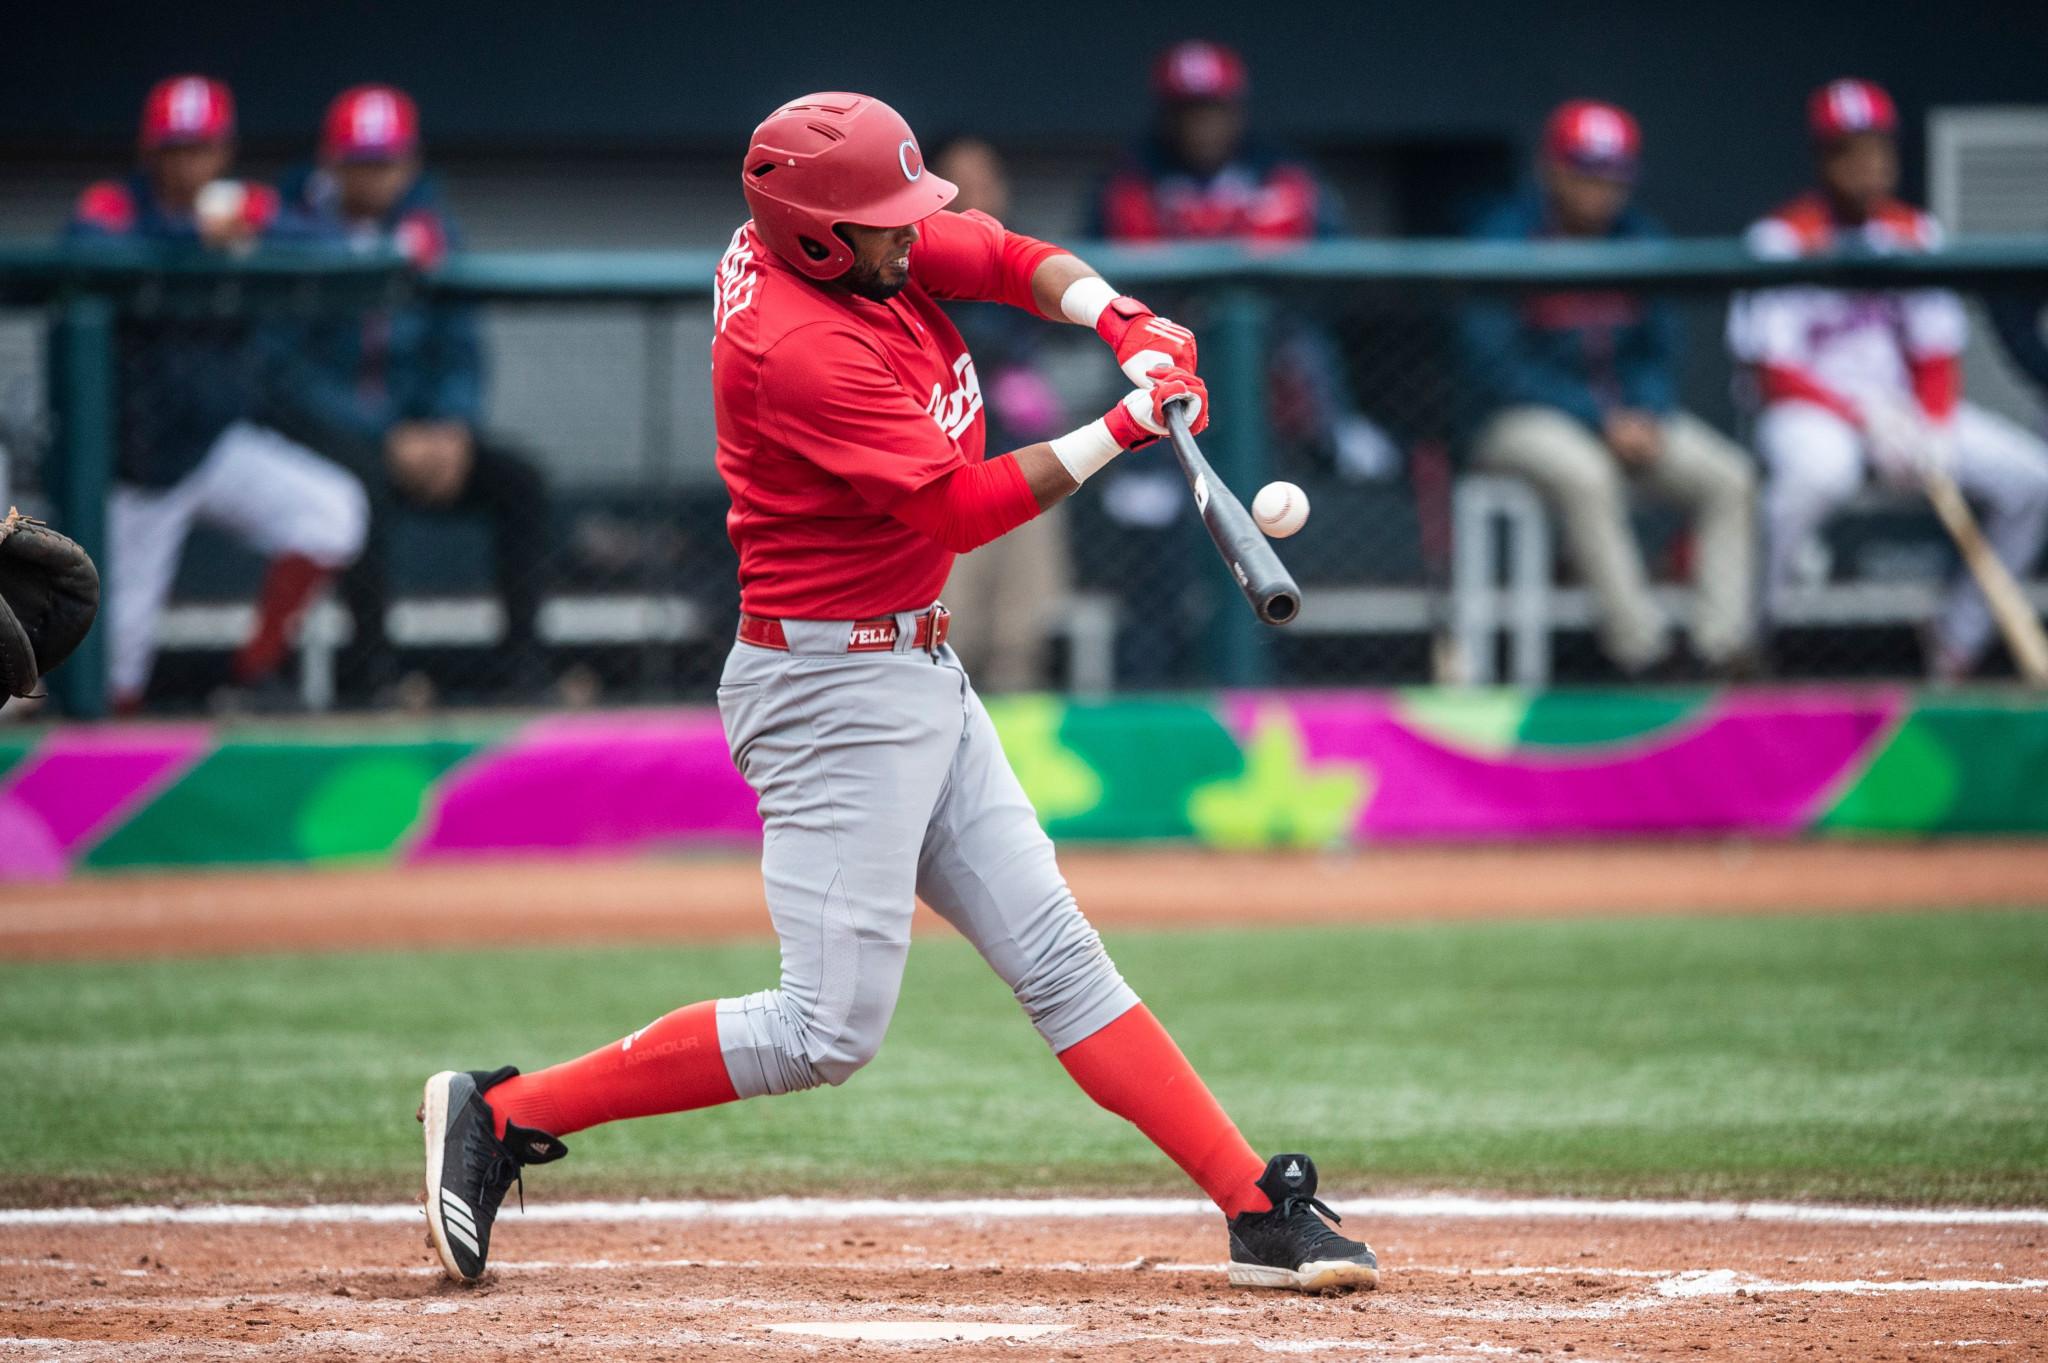 Barranquilla to host baseball at Junior Pan American Games